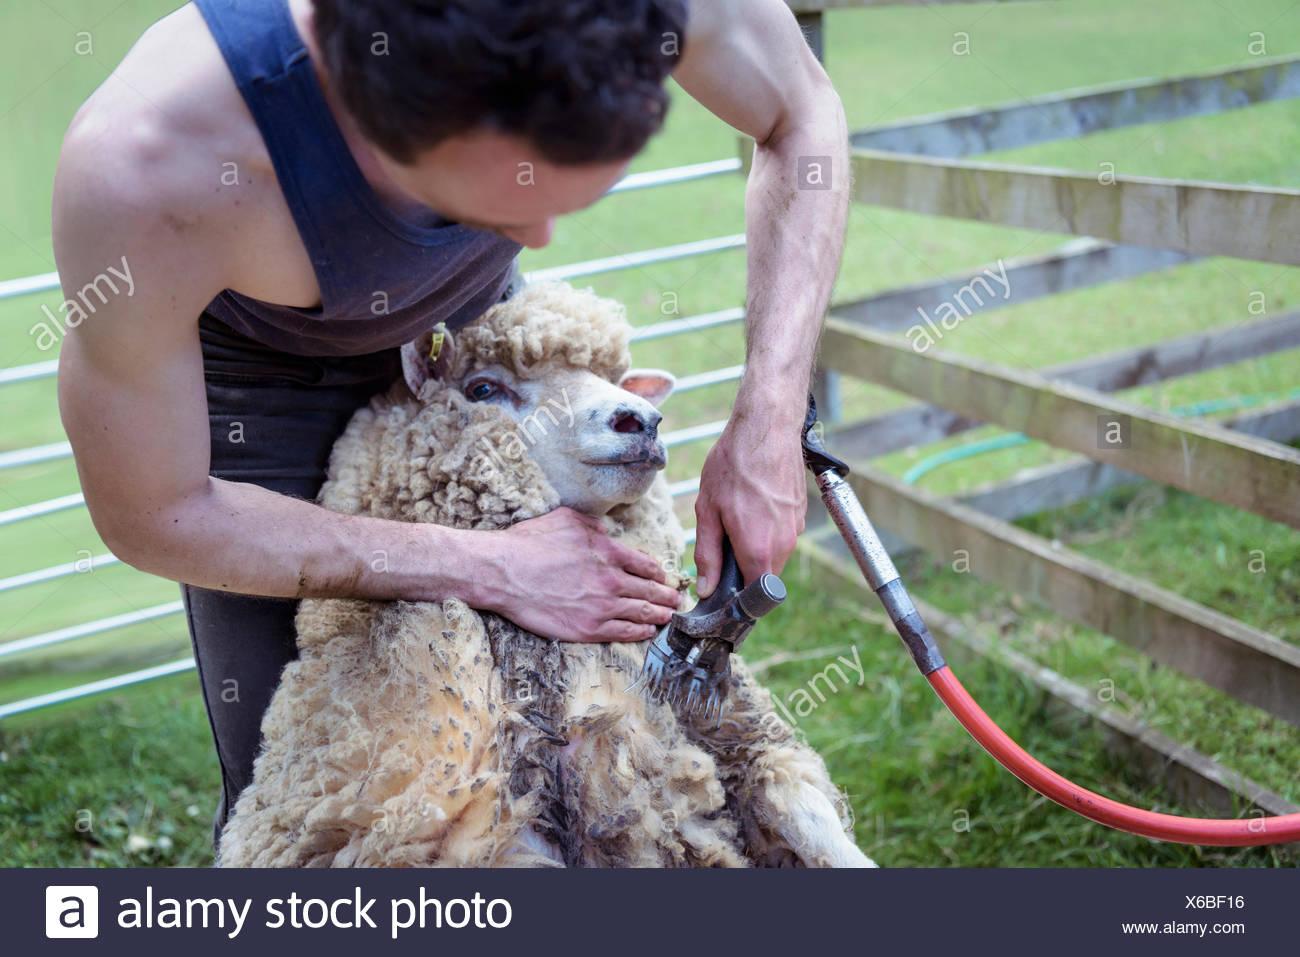 Sheep shearer using shearing tool on sheep - Stock Image